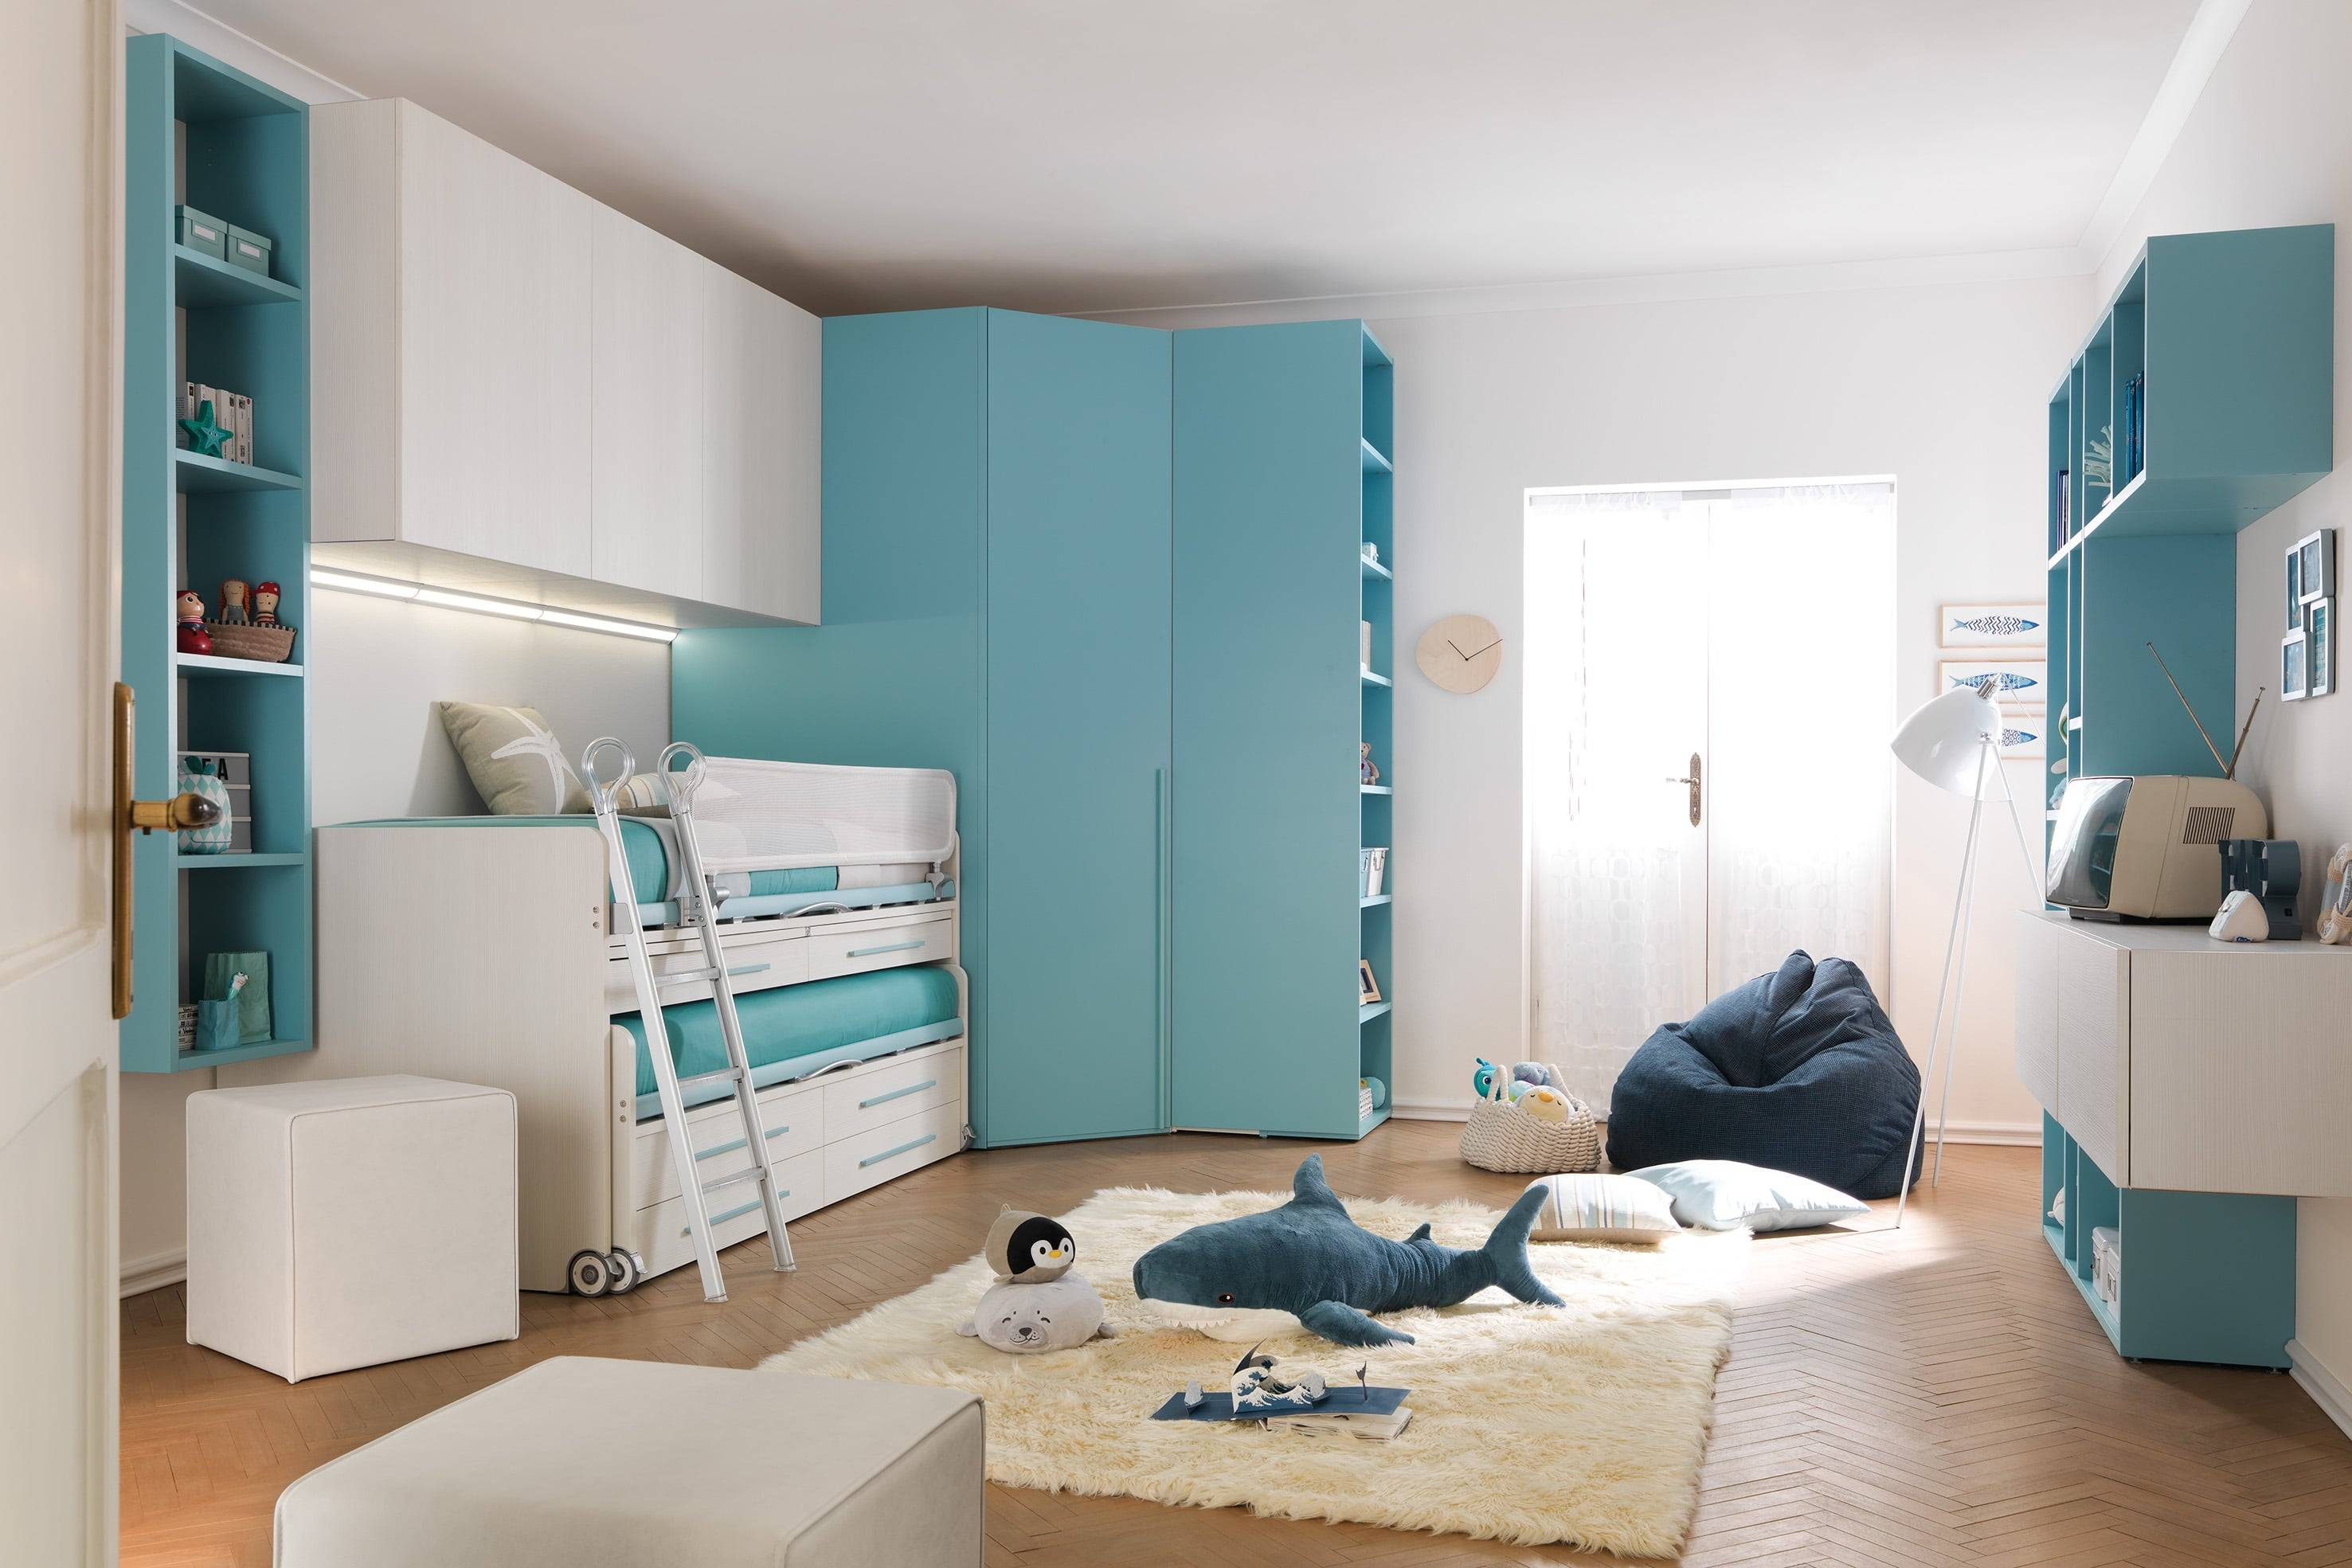 Spaceman Kids Beds Furniture space saving bunk beds loft beds trundle beds